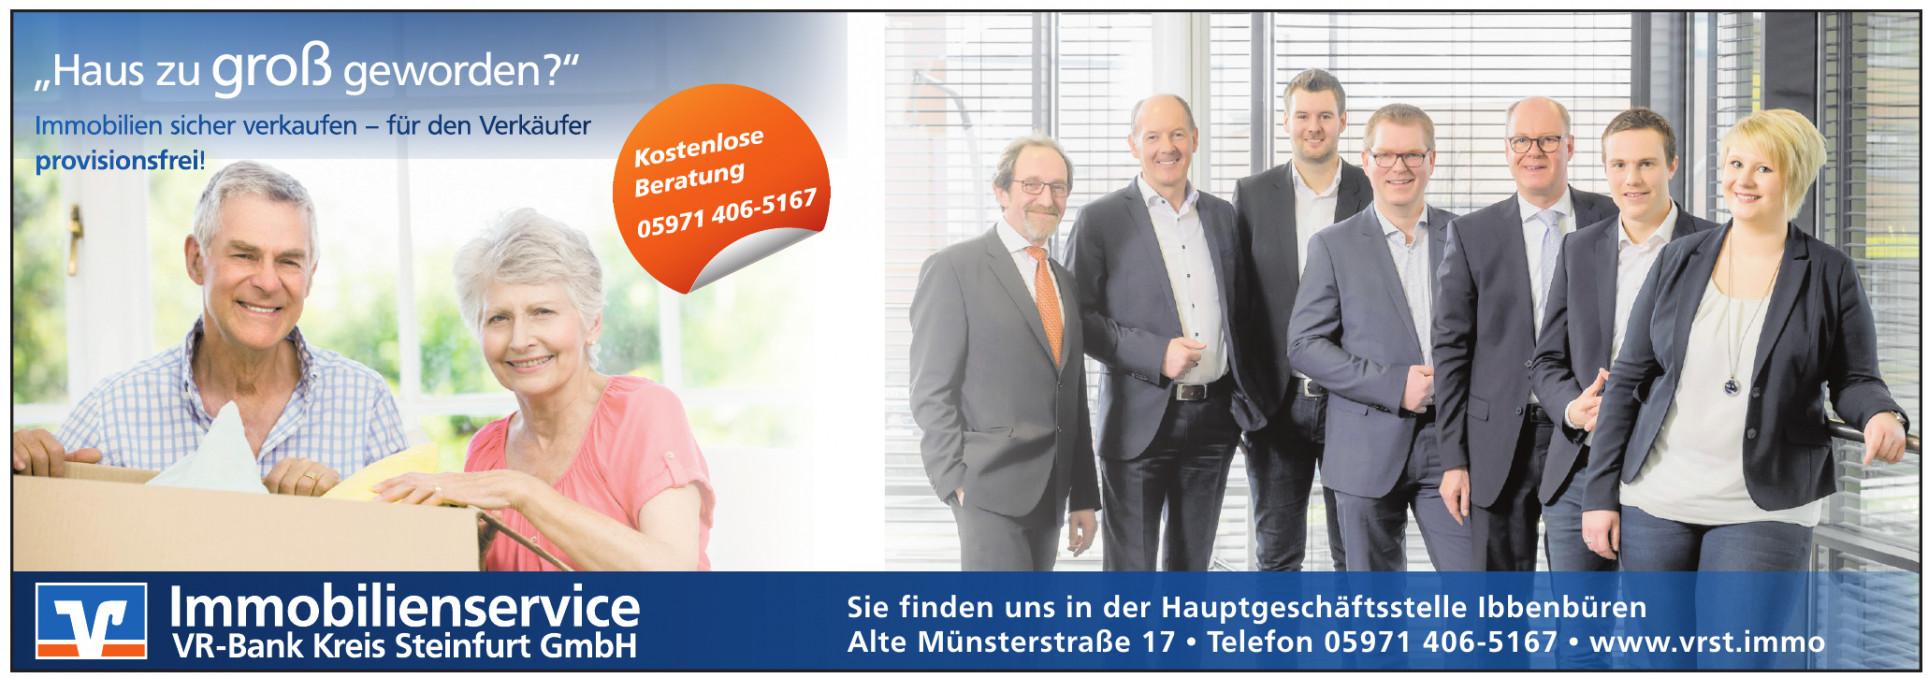 Immobilienservice VR-Bank Kreis Steinfurt GmbH